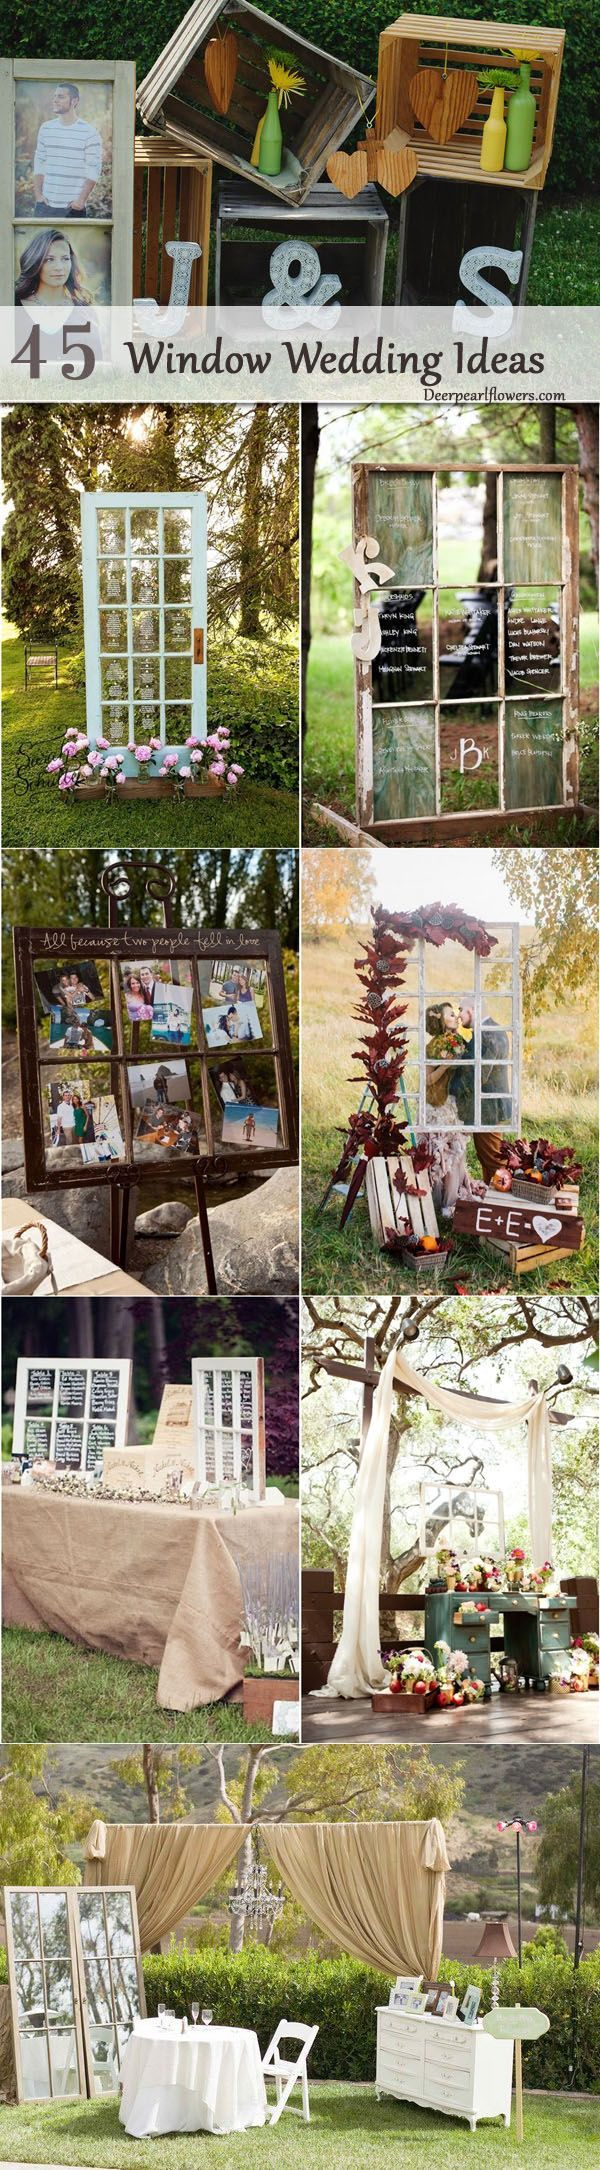 best 25 wedding window decorations ideas on pinterest window